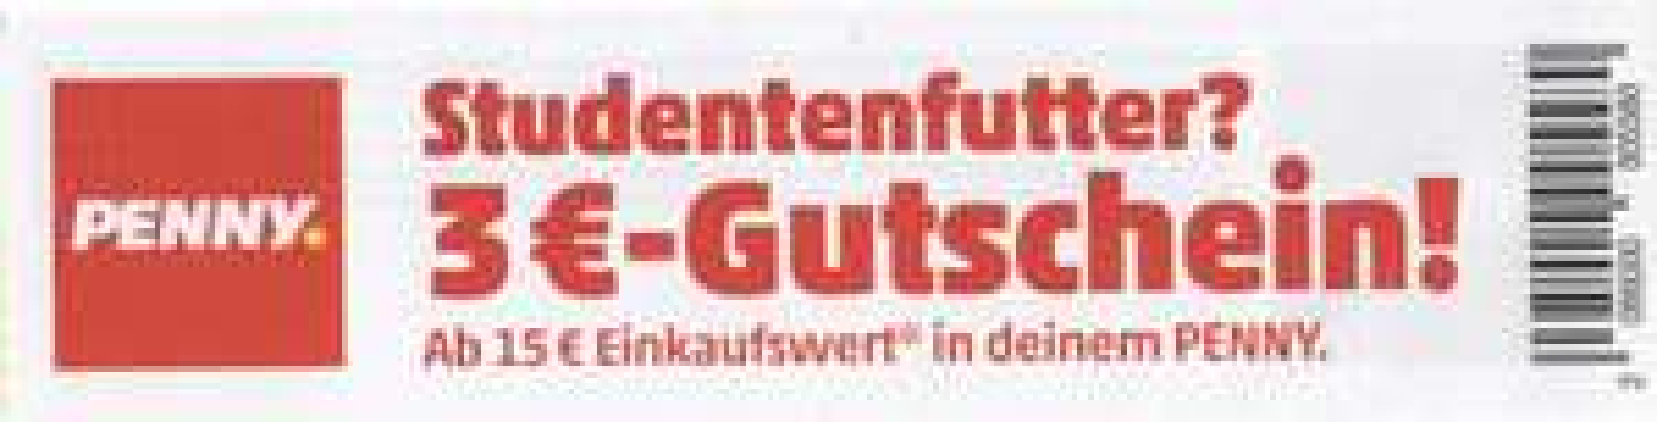 [Lokal Münster] Penny 3€ Rabatt ab 15€ Einkaufswert